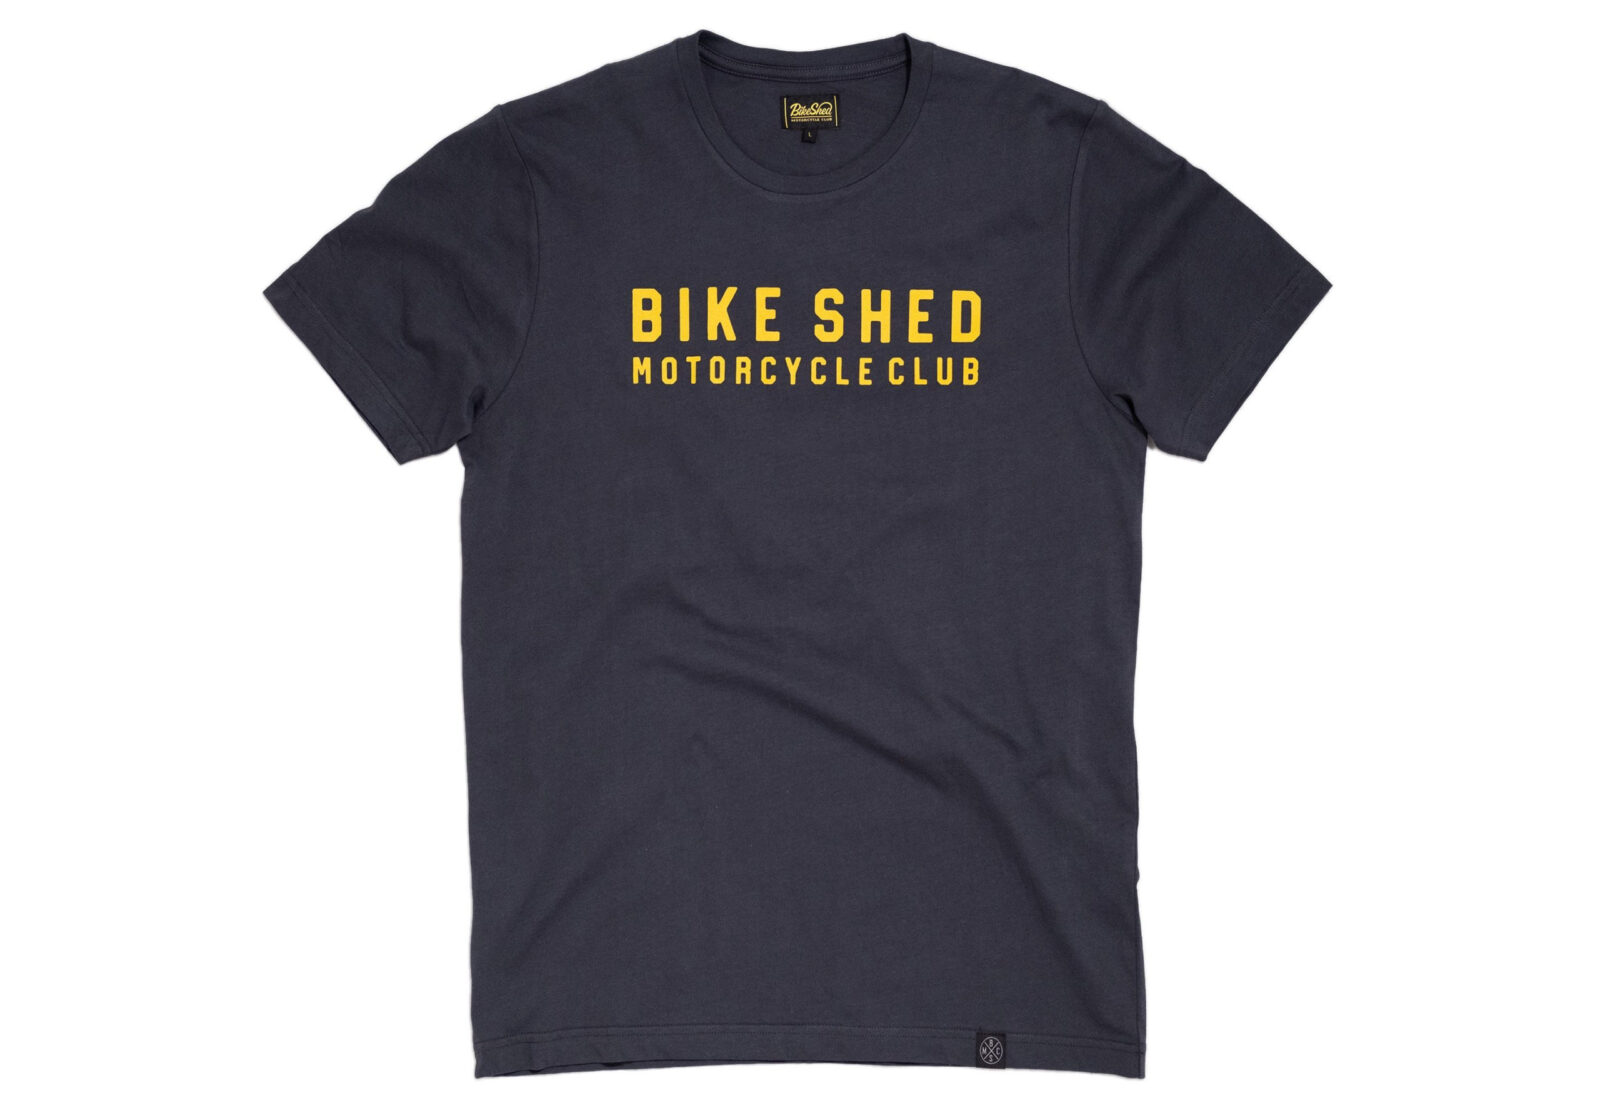 Bike Shed Motorcycle Club Brick T-Shirt